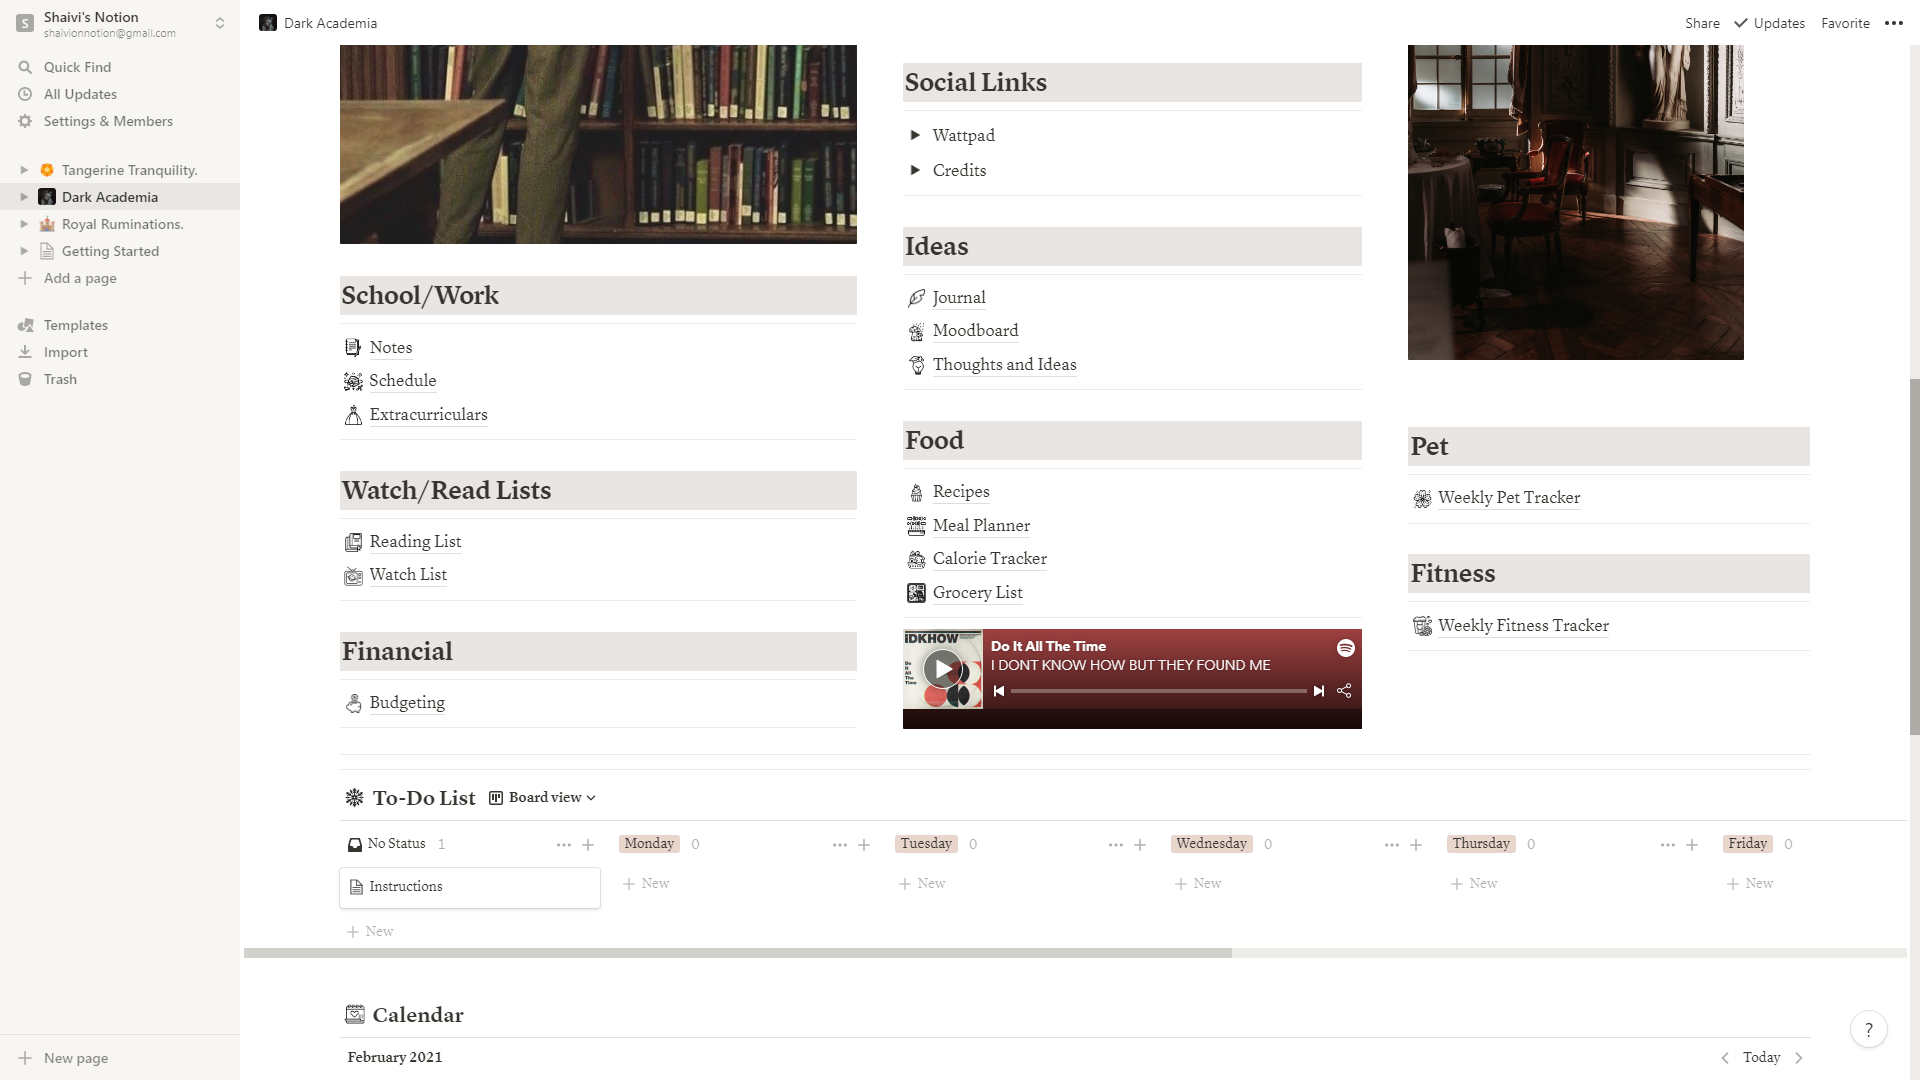 Life Wiki (Dark Academia Aesthetic)